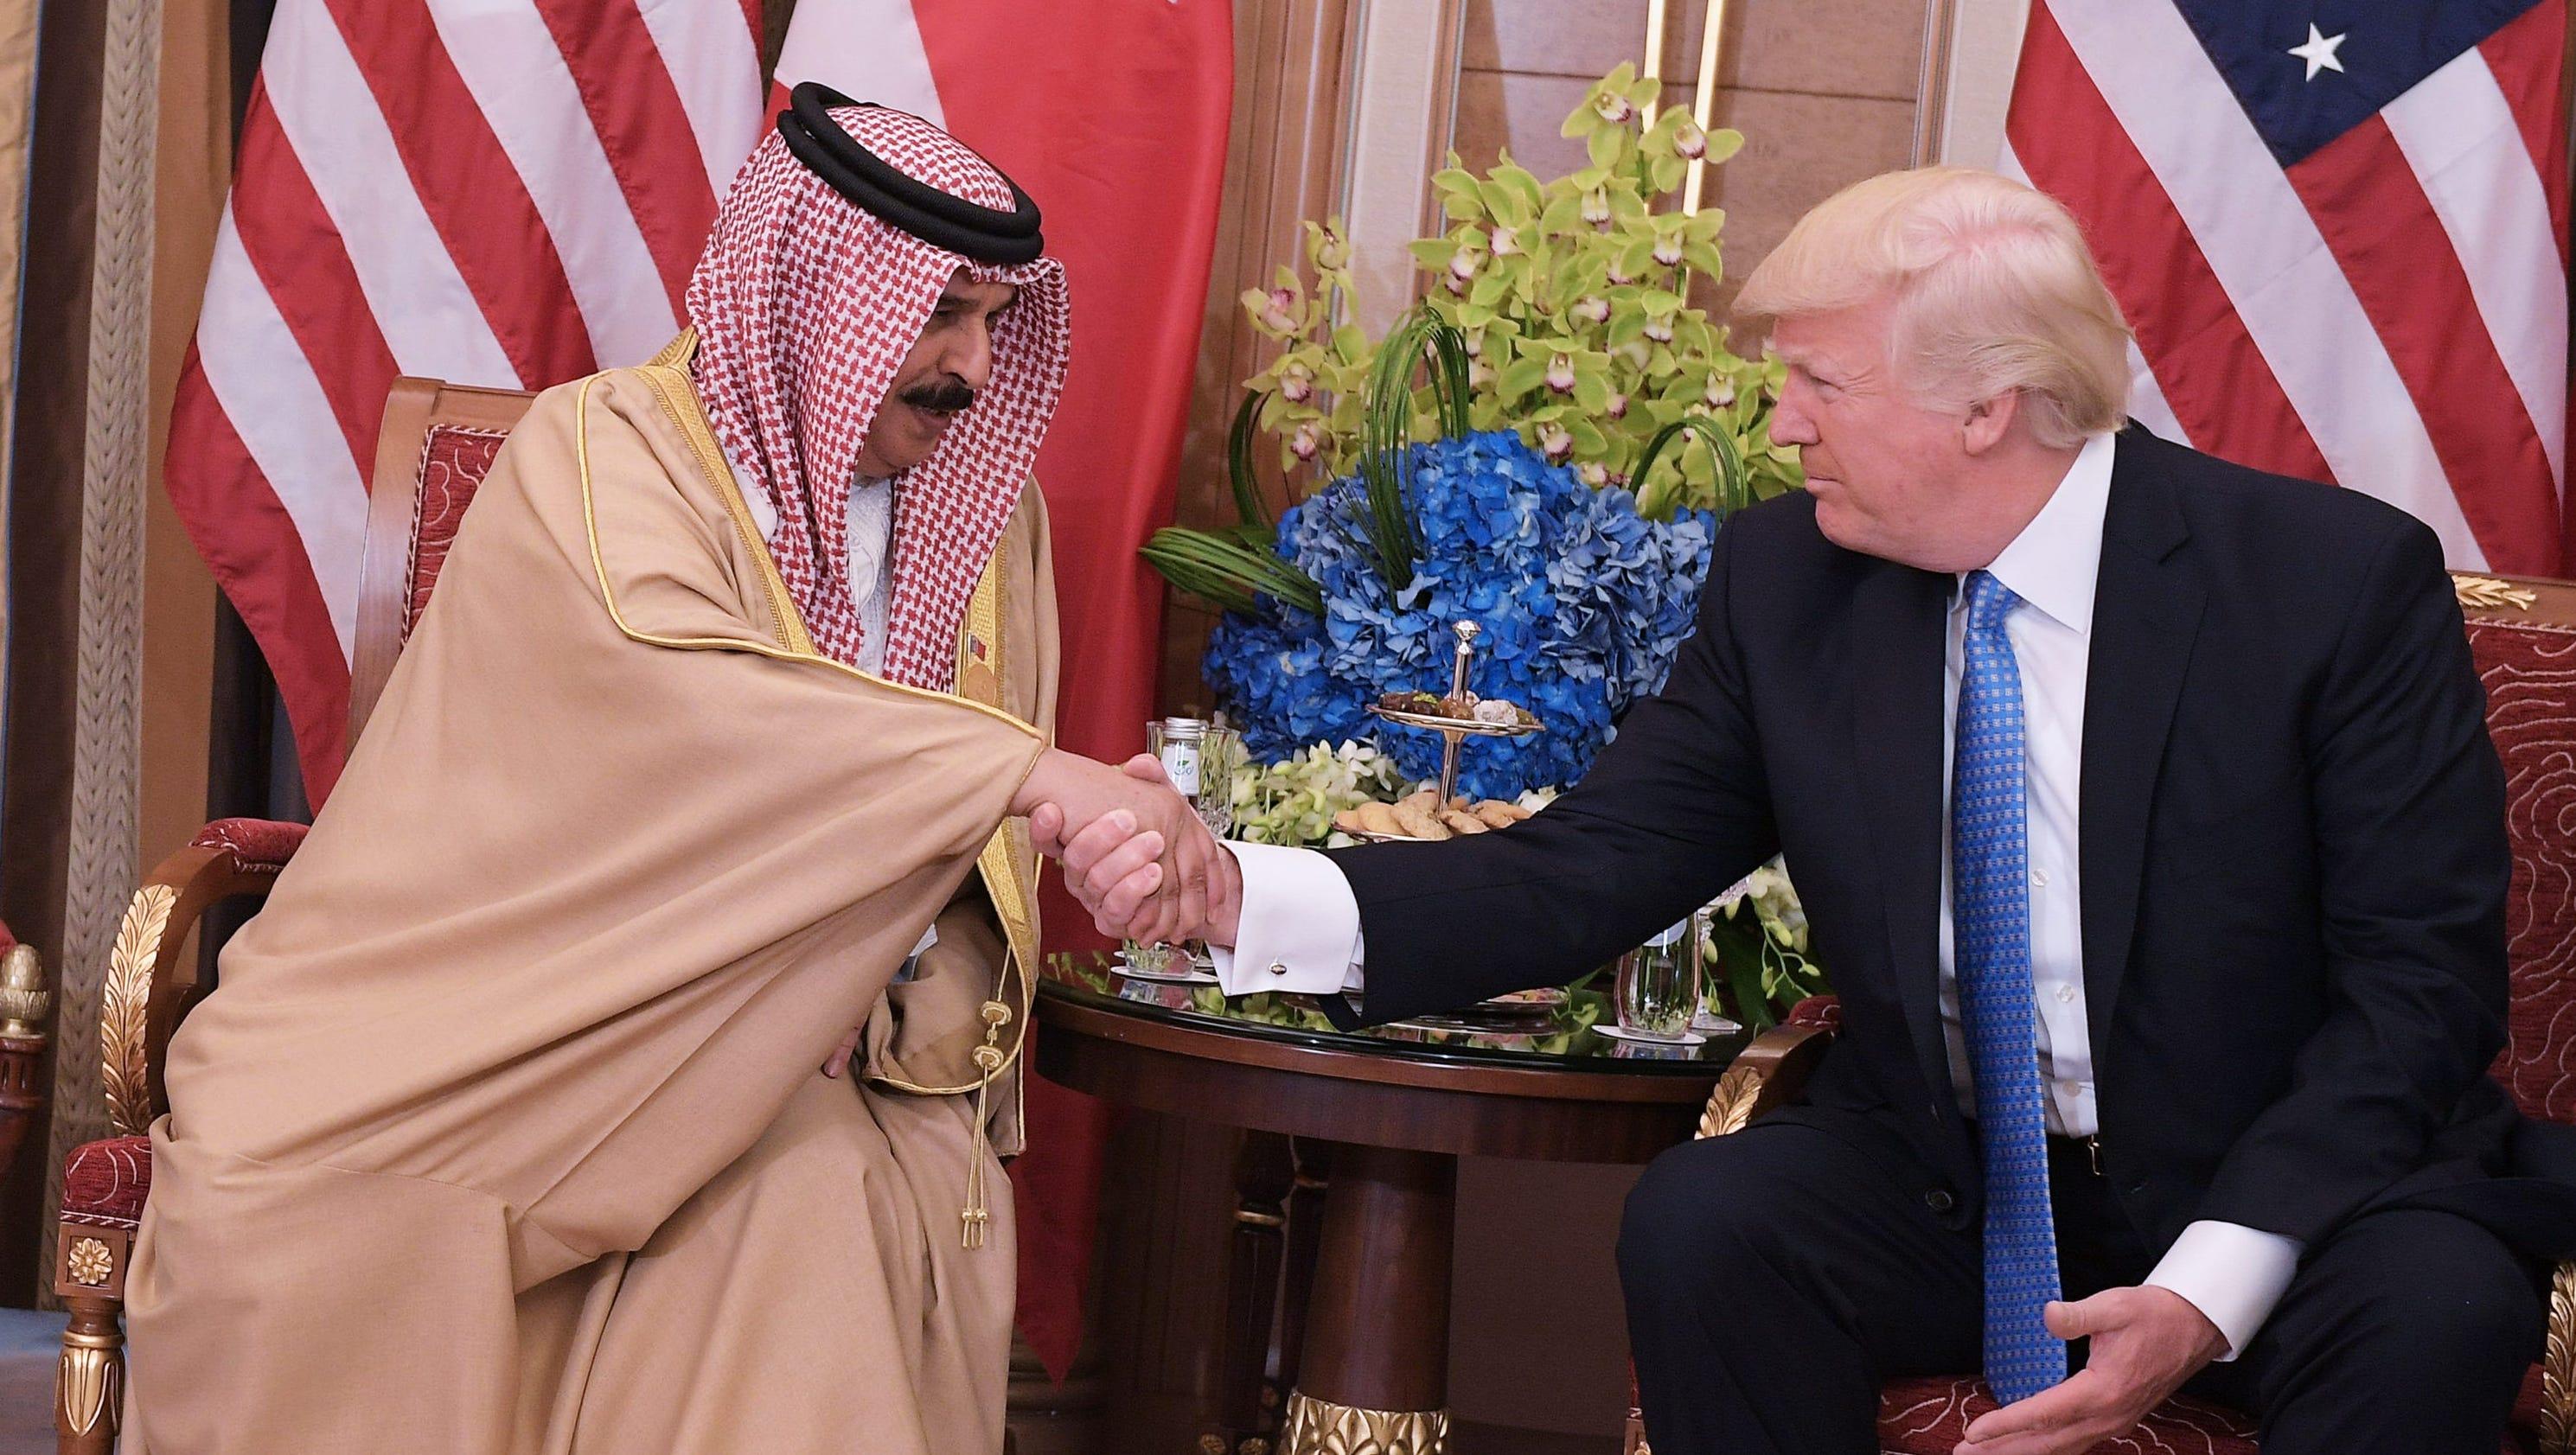 Trump hawks 'beautiful' U.S. weapons to unite Muslim world against terror